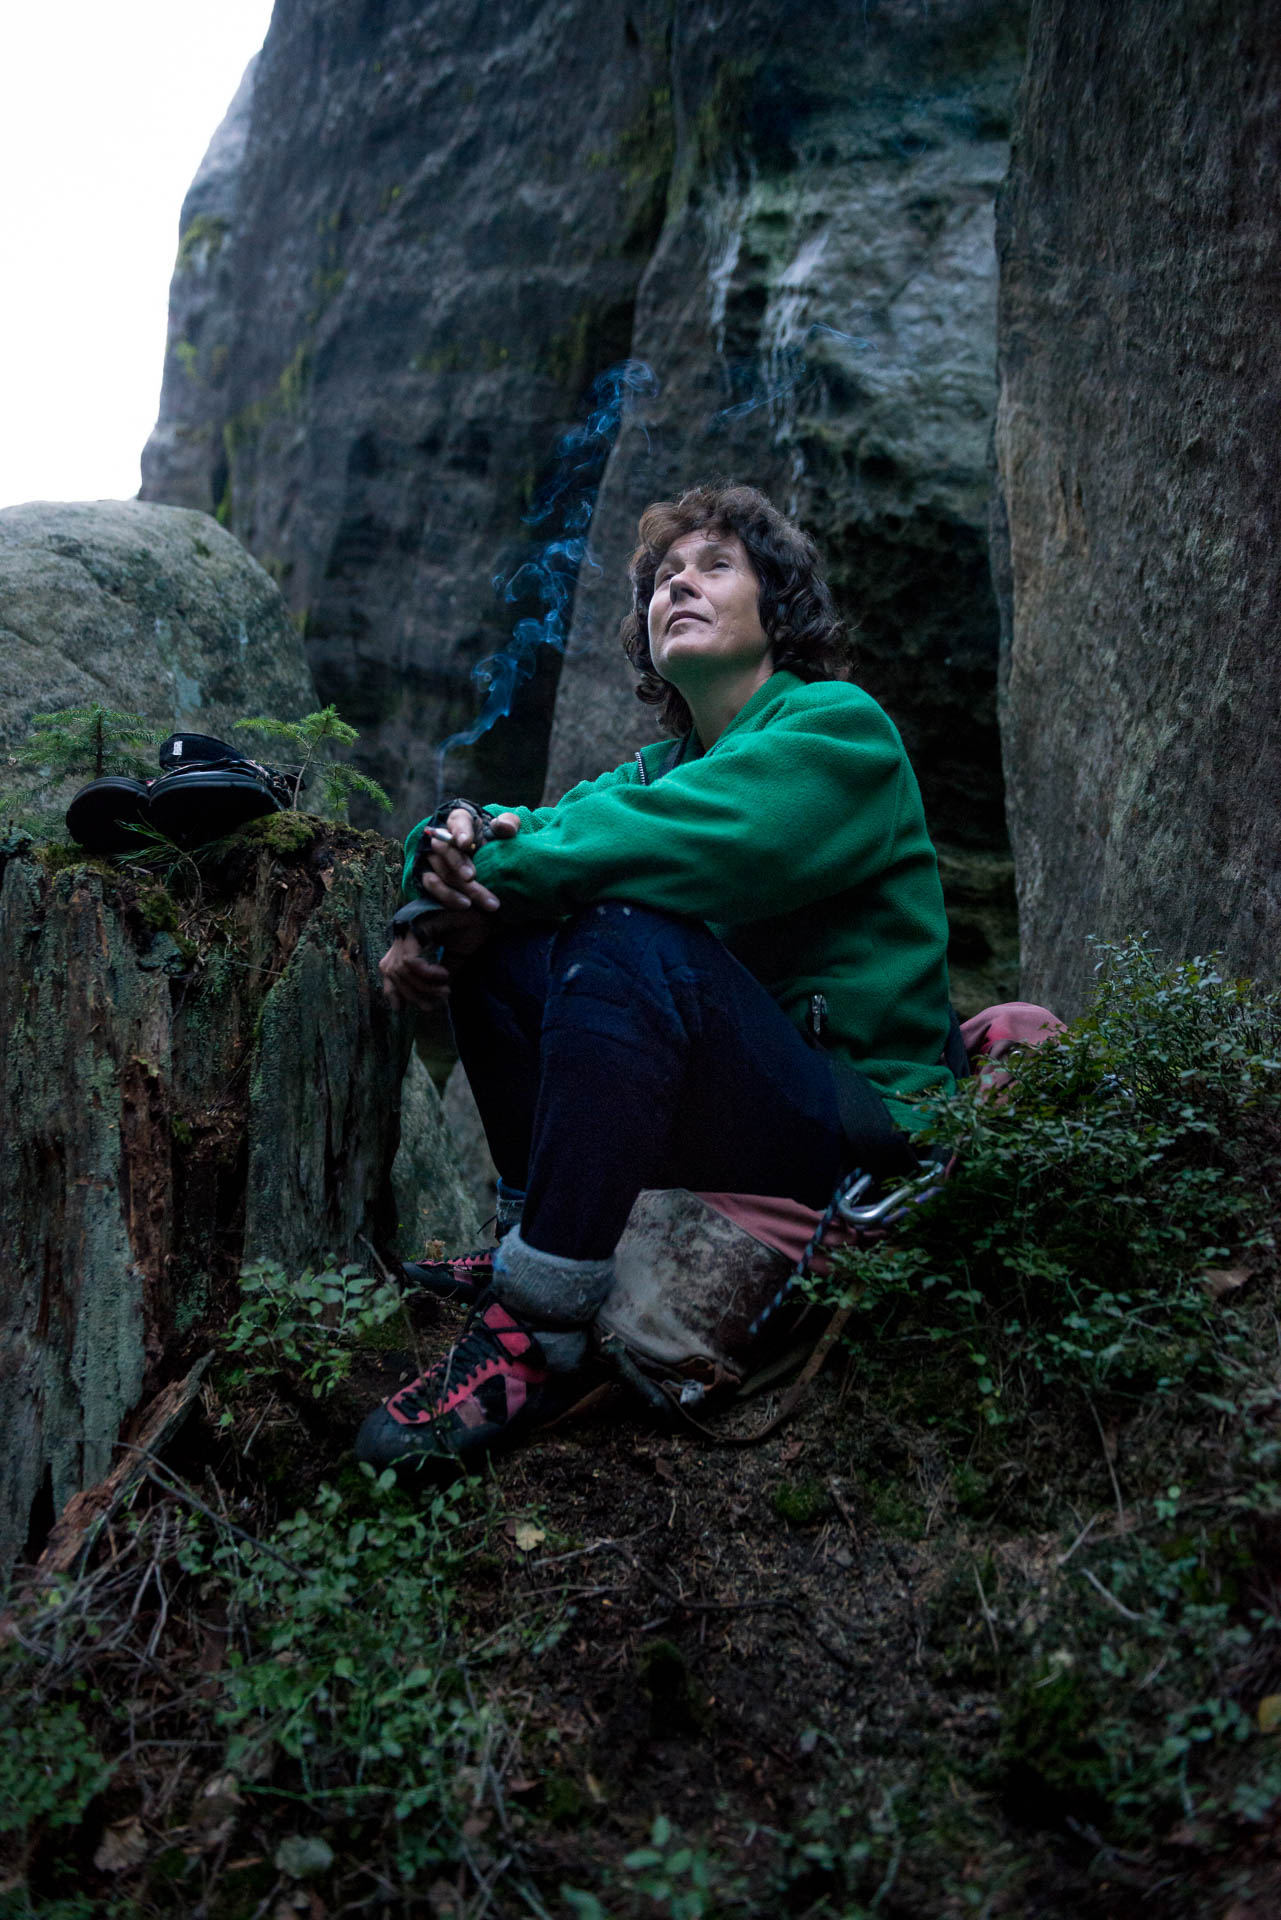 Adrspach klimmen klimster vrouw lTsjechië fotografie Frank Penders